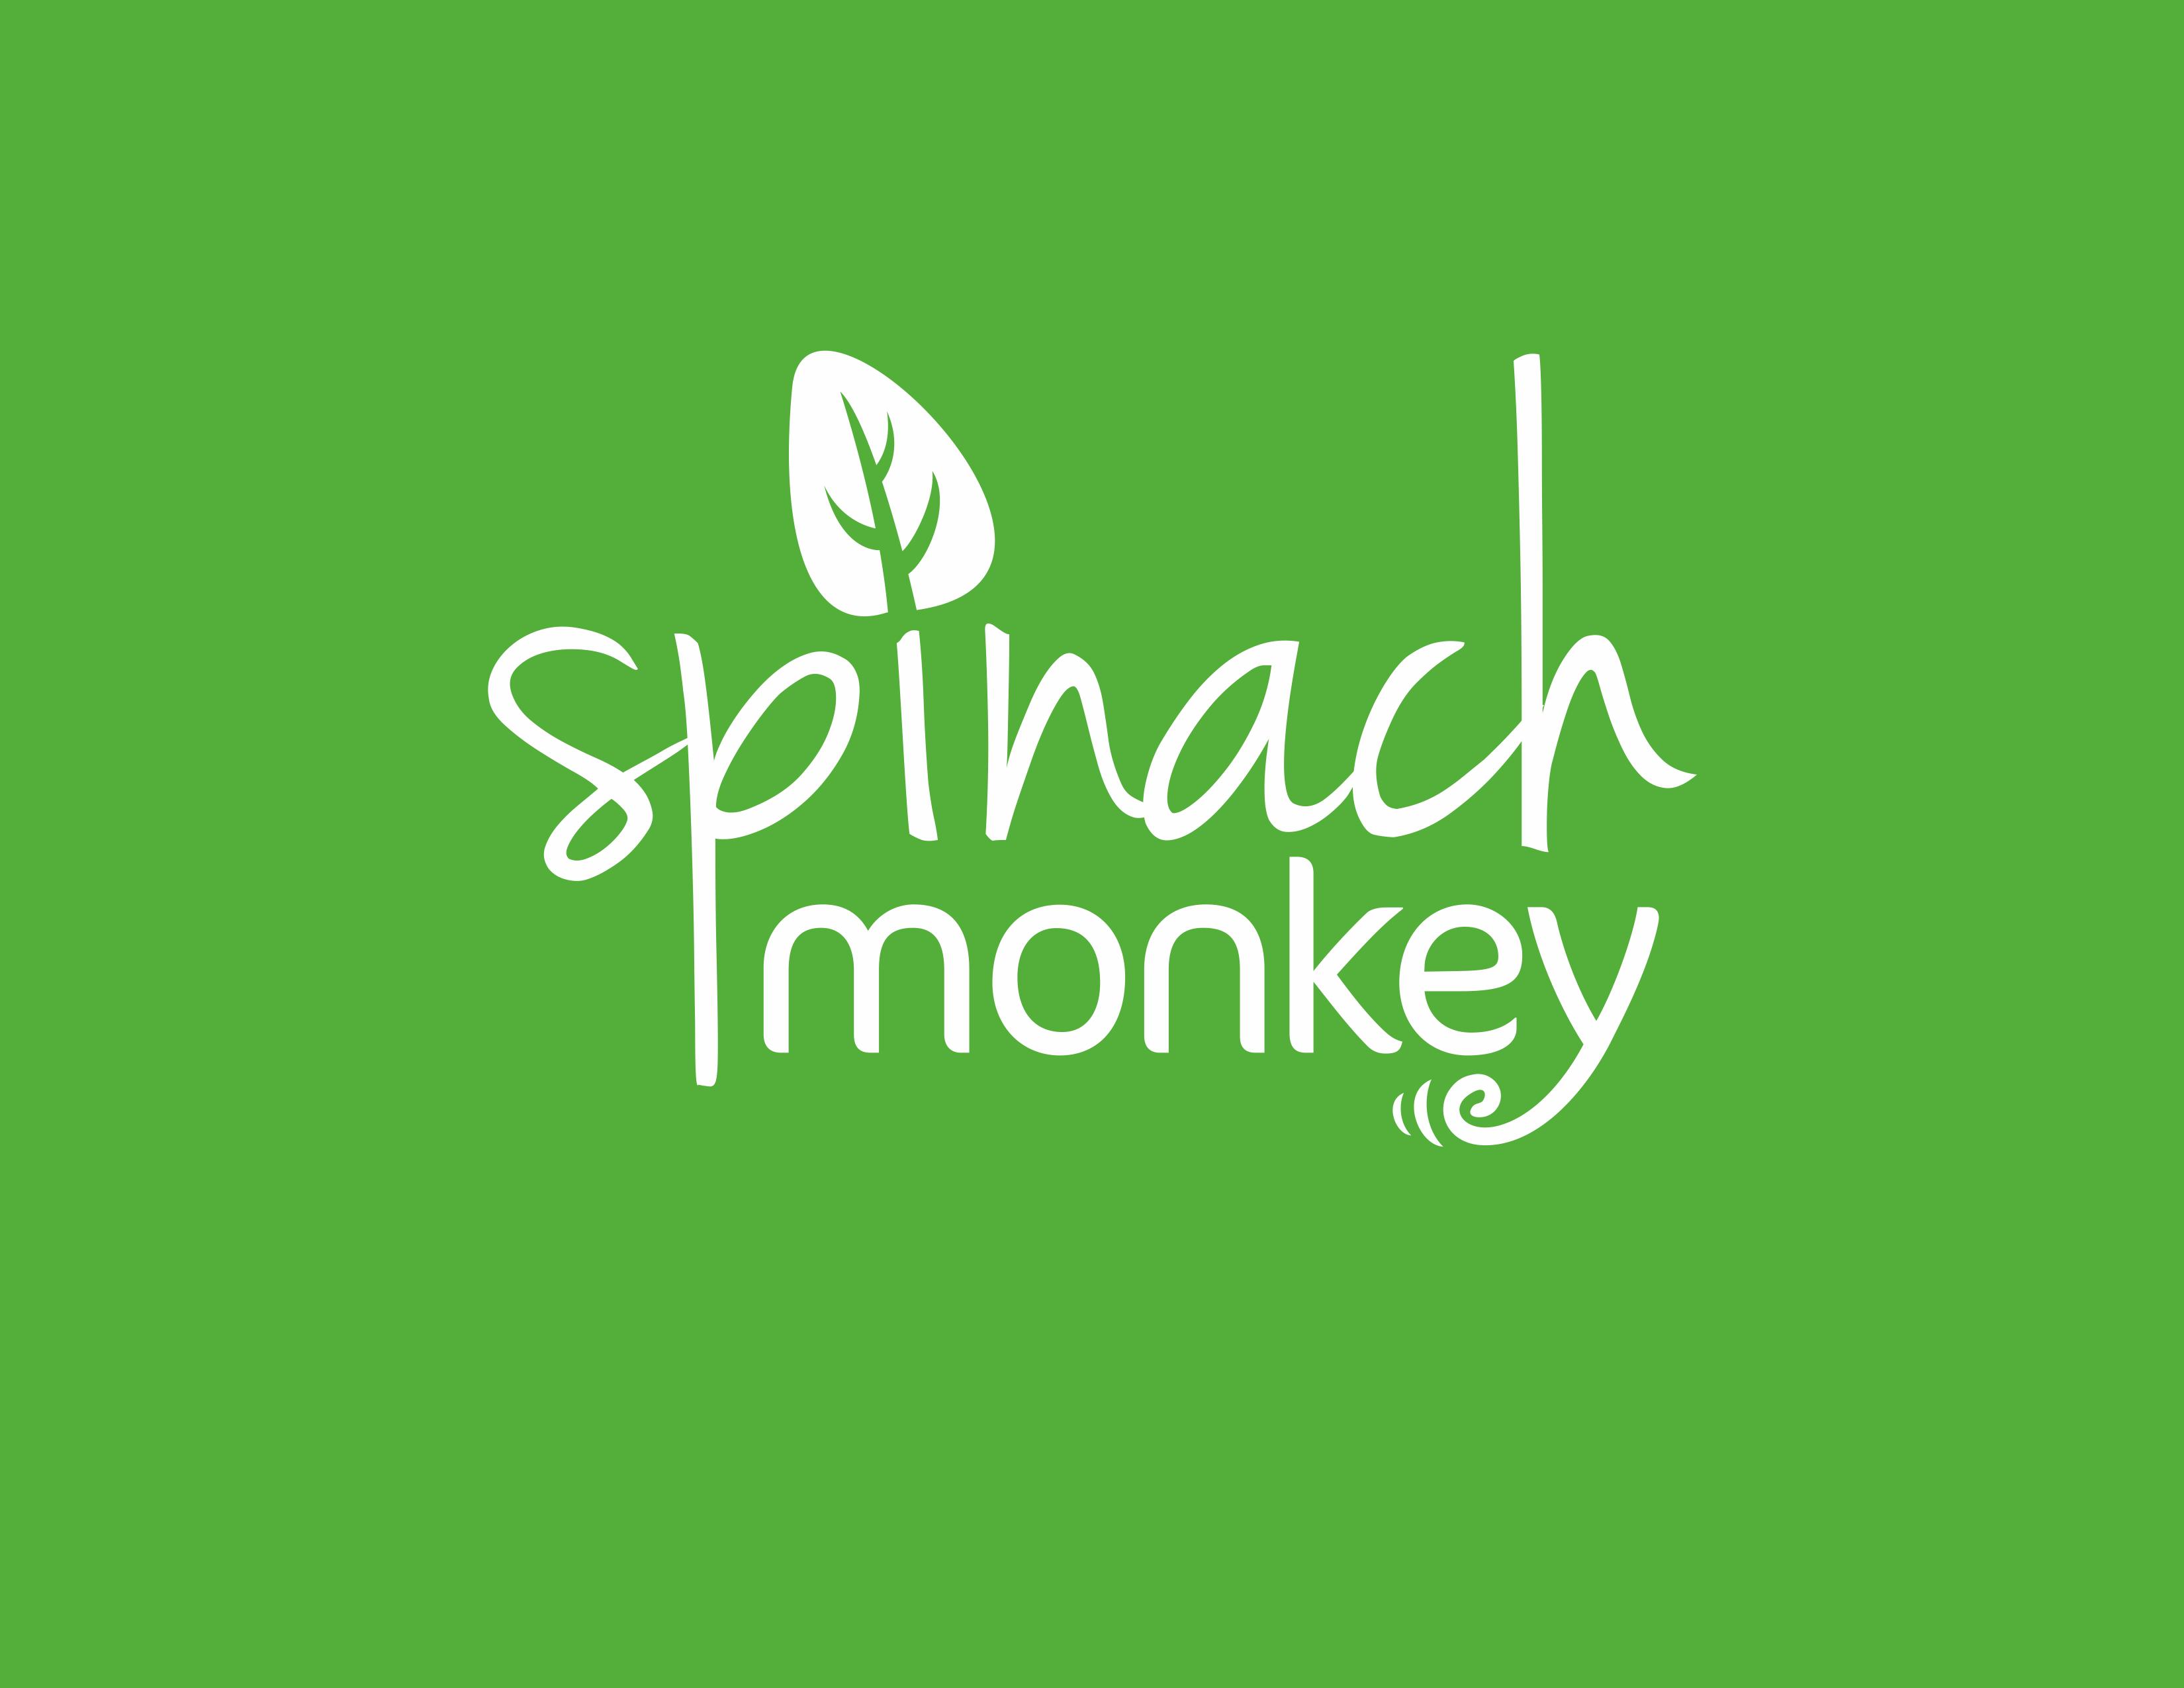 Design a fun fresh logo for a healthy food blog/business called Spinach Monkey